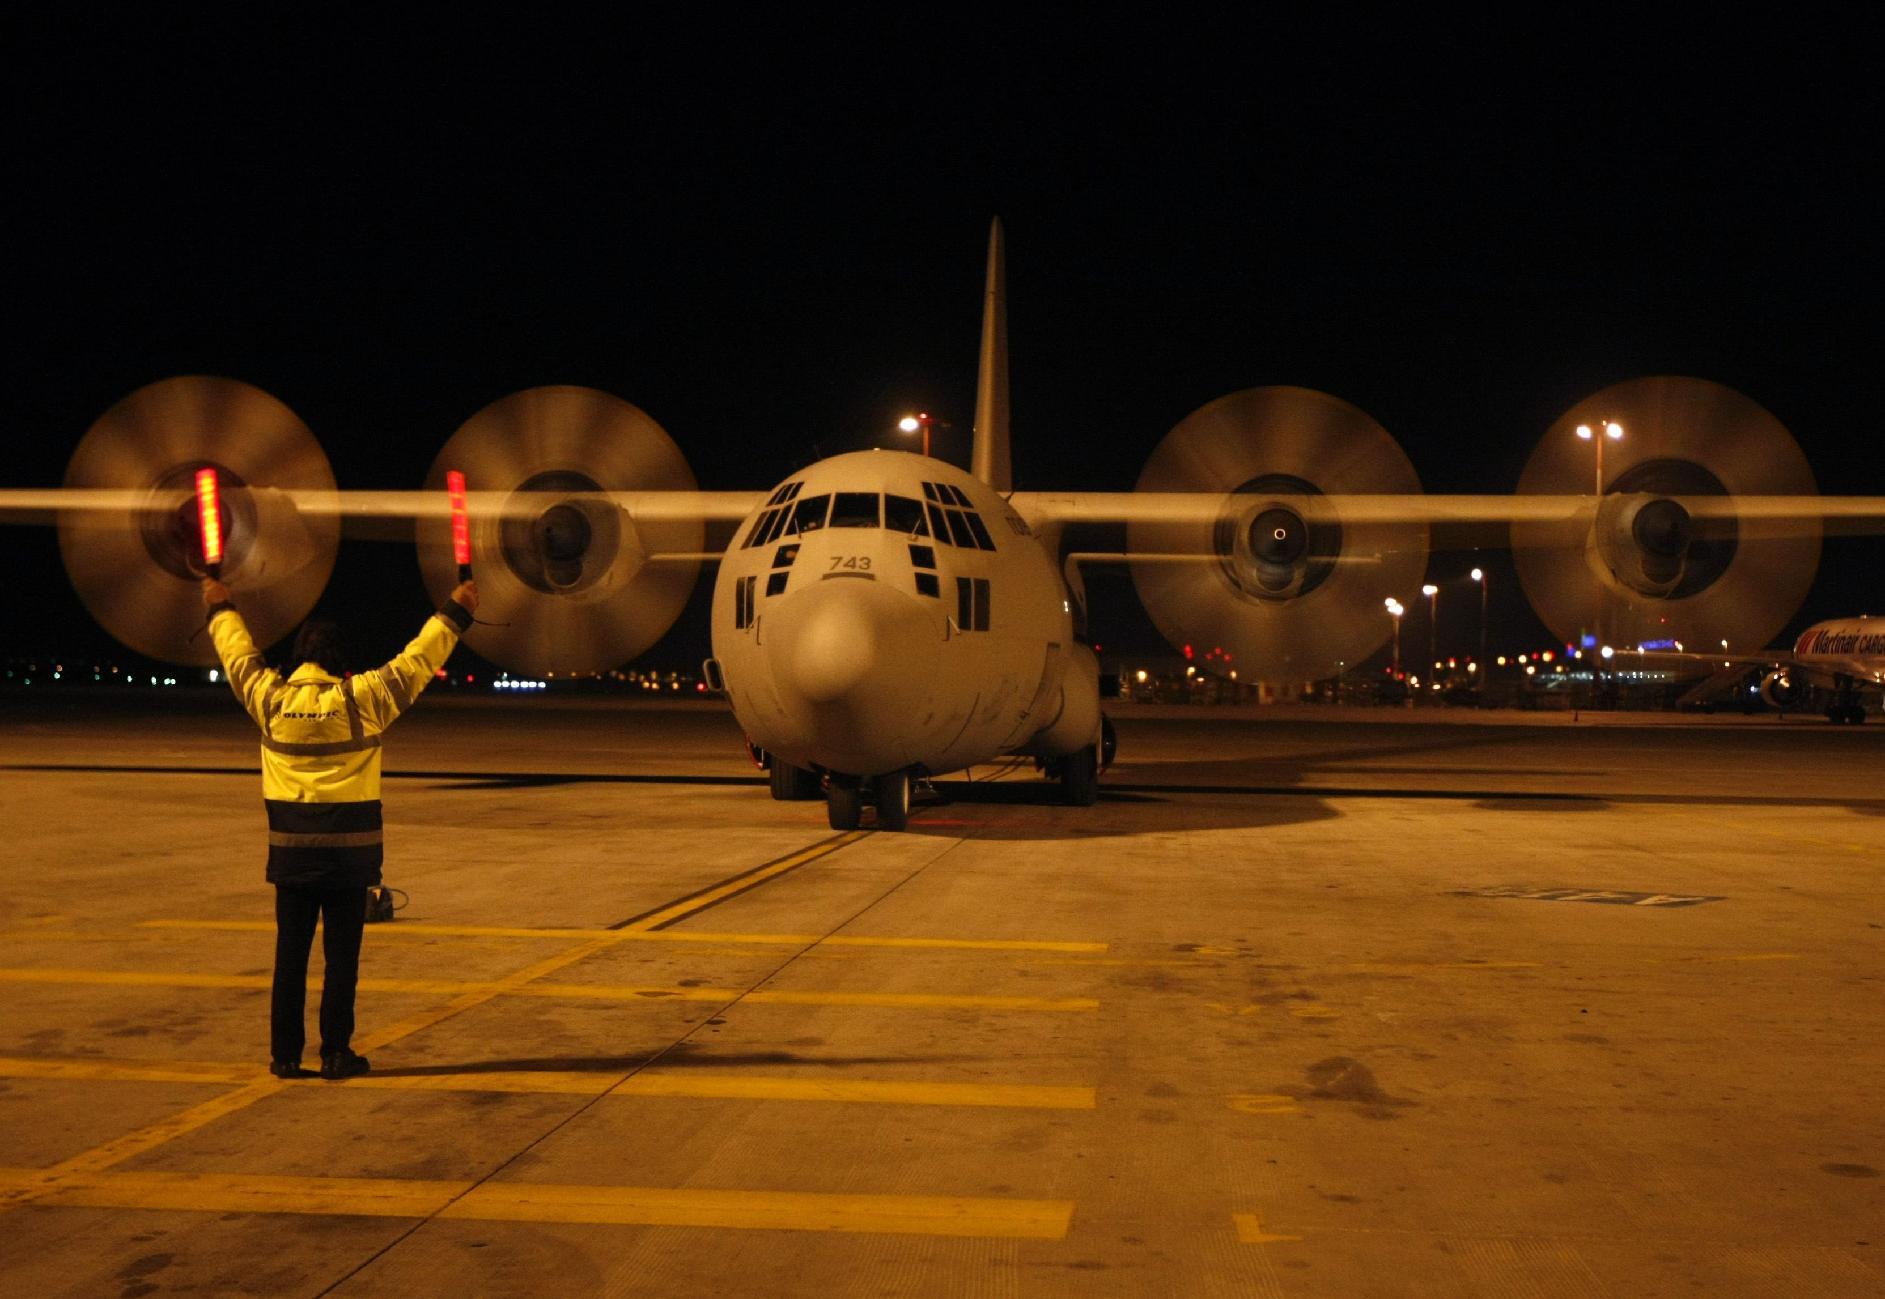 C-130 ΑΠΟ ΛΙΒΥΗ ΑΘΗΝΑ ΕΛΕΥΘΕΡΙΟΣ ΒΕΝΙΖΕΛΟΣ